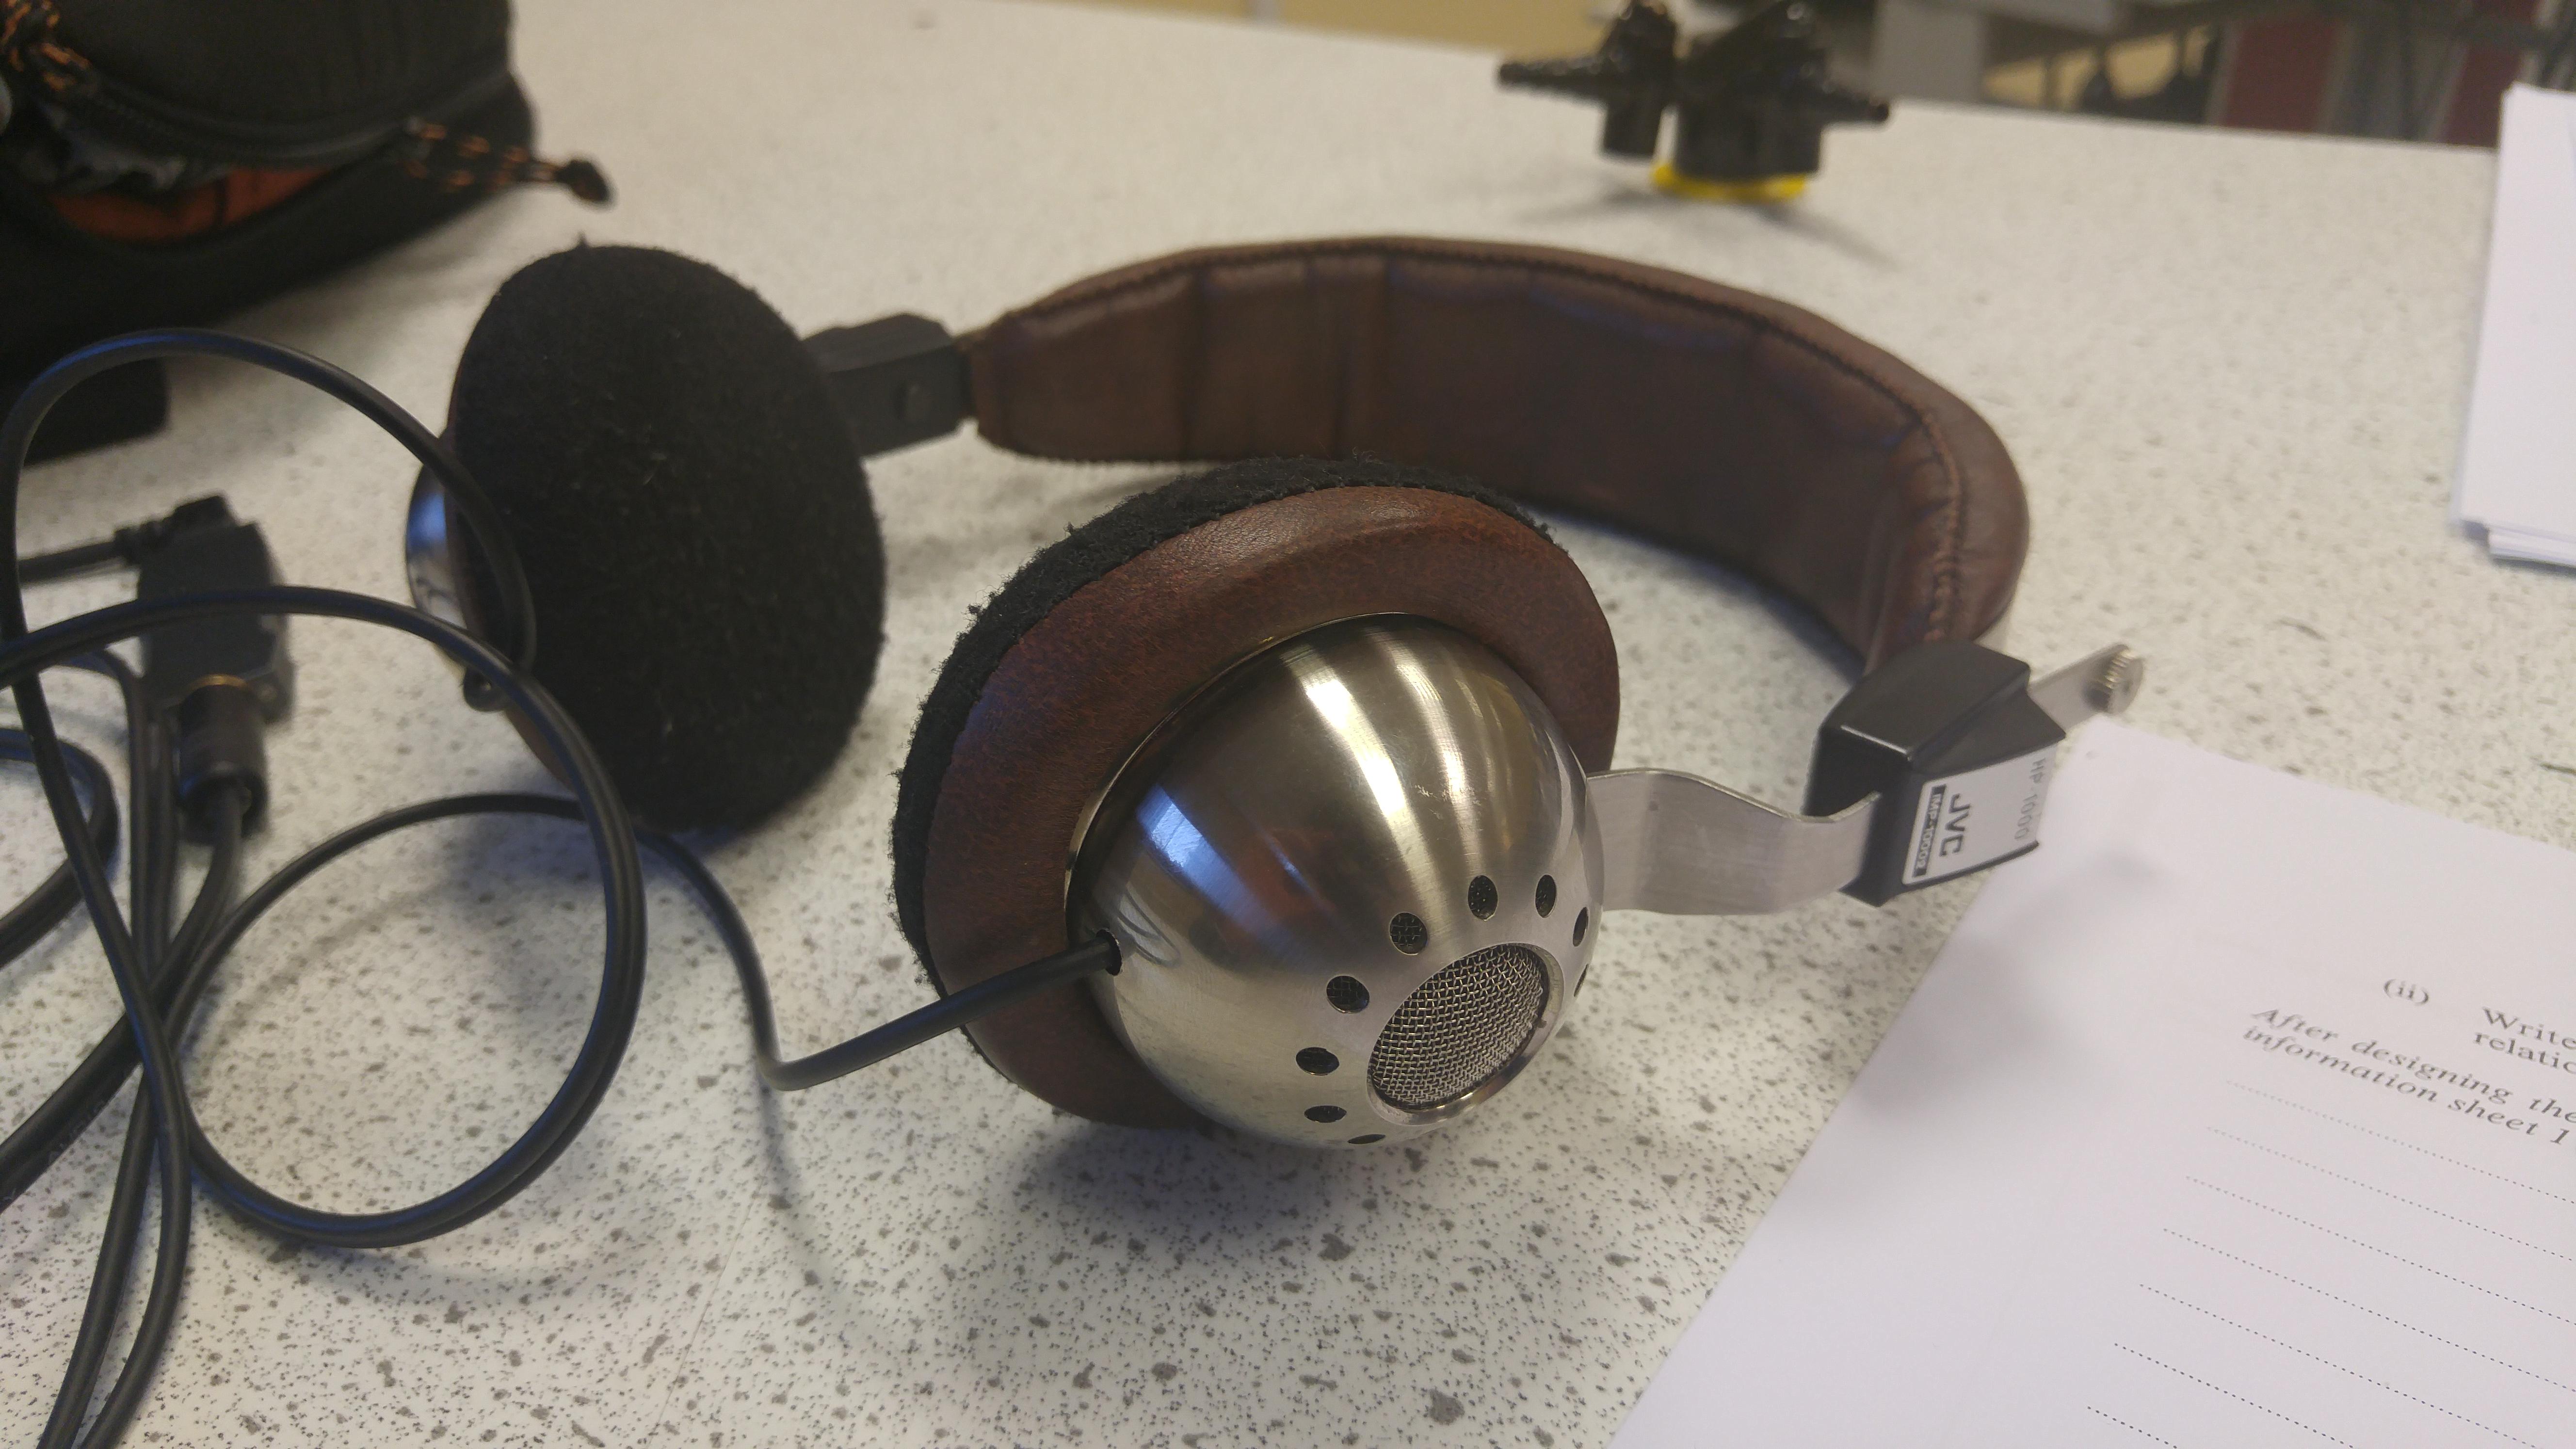 b2b307261de Show us your vintage headphones!   Page 110   Headphone Reviews and ...